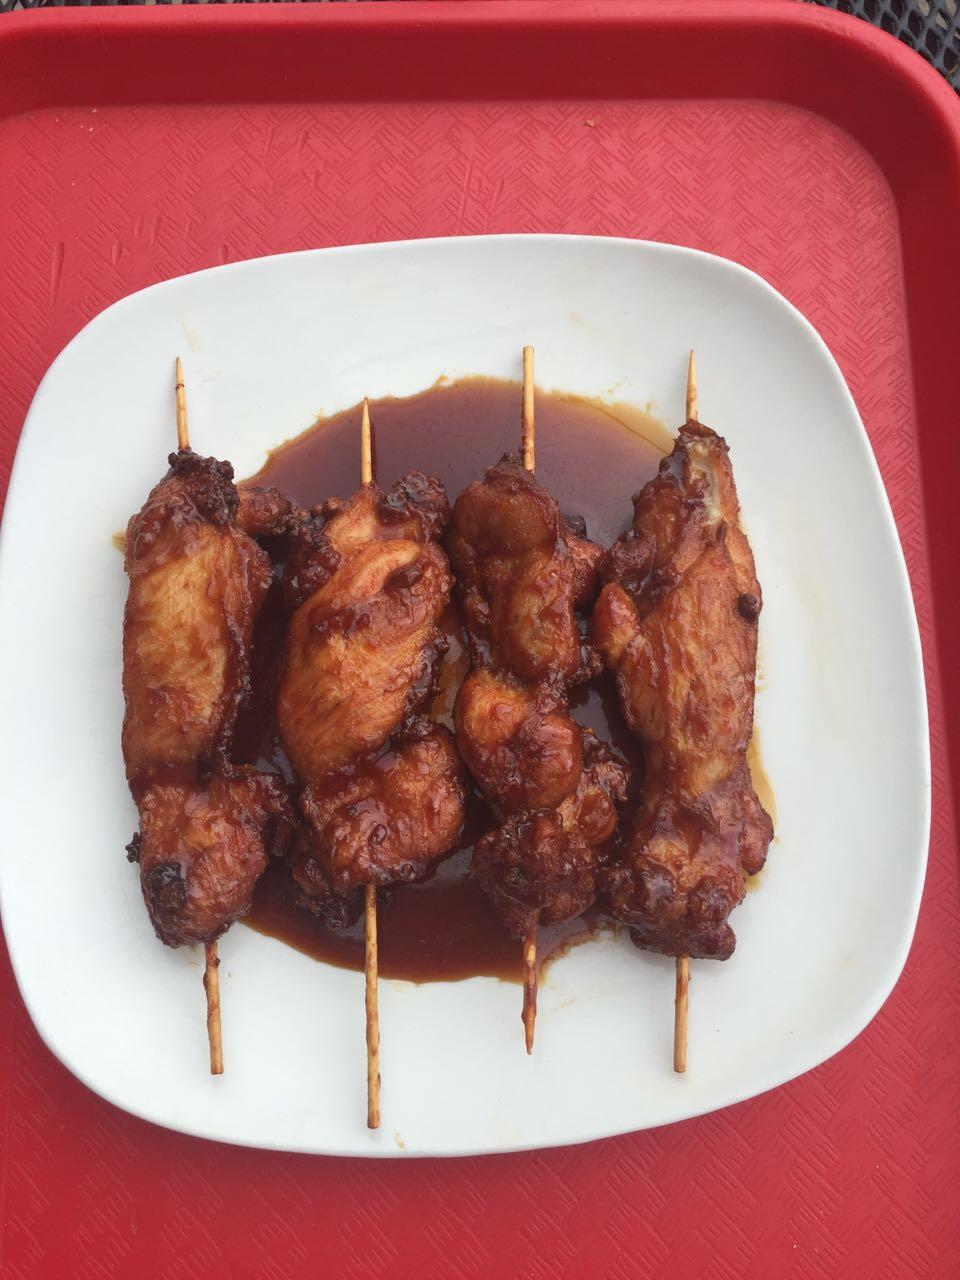 S15. Chicken Skewer (4) 鸡串 Image